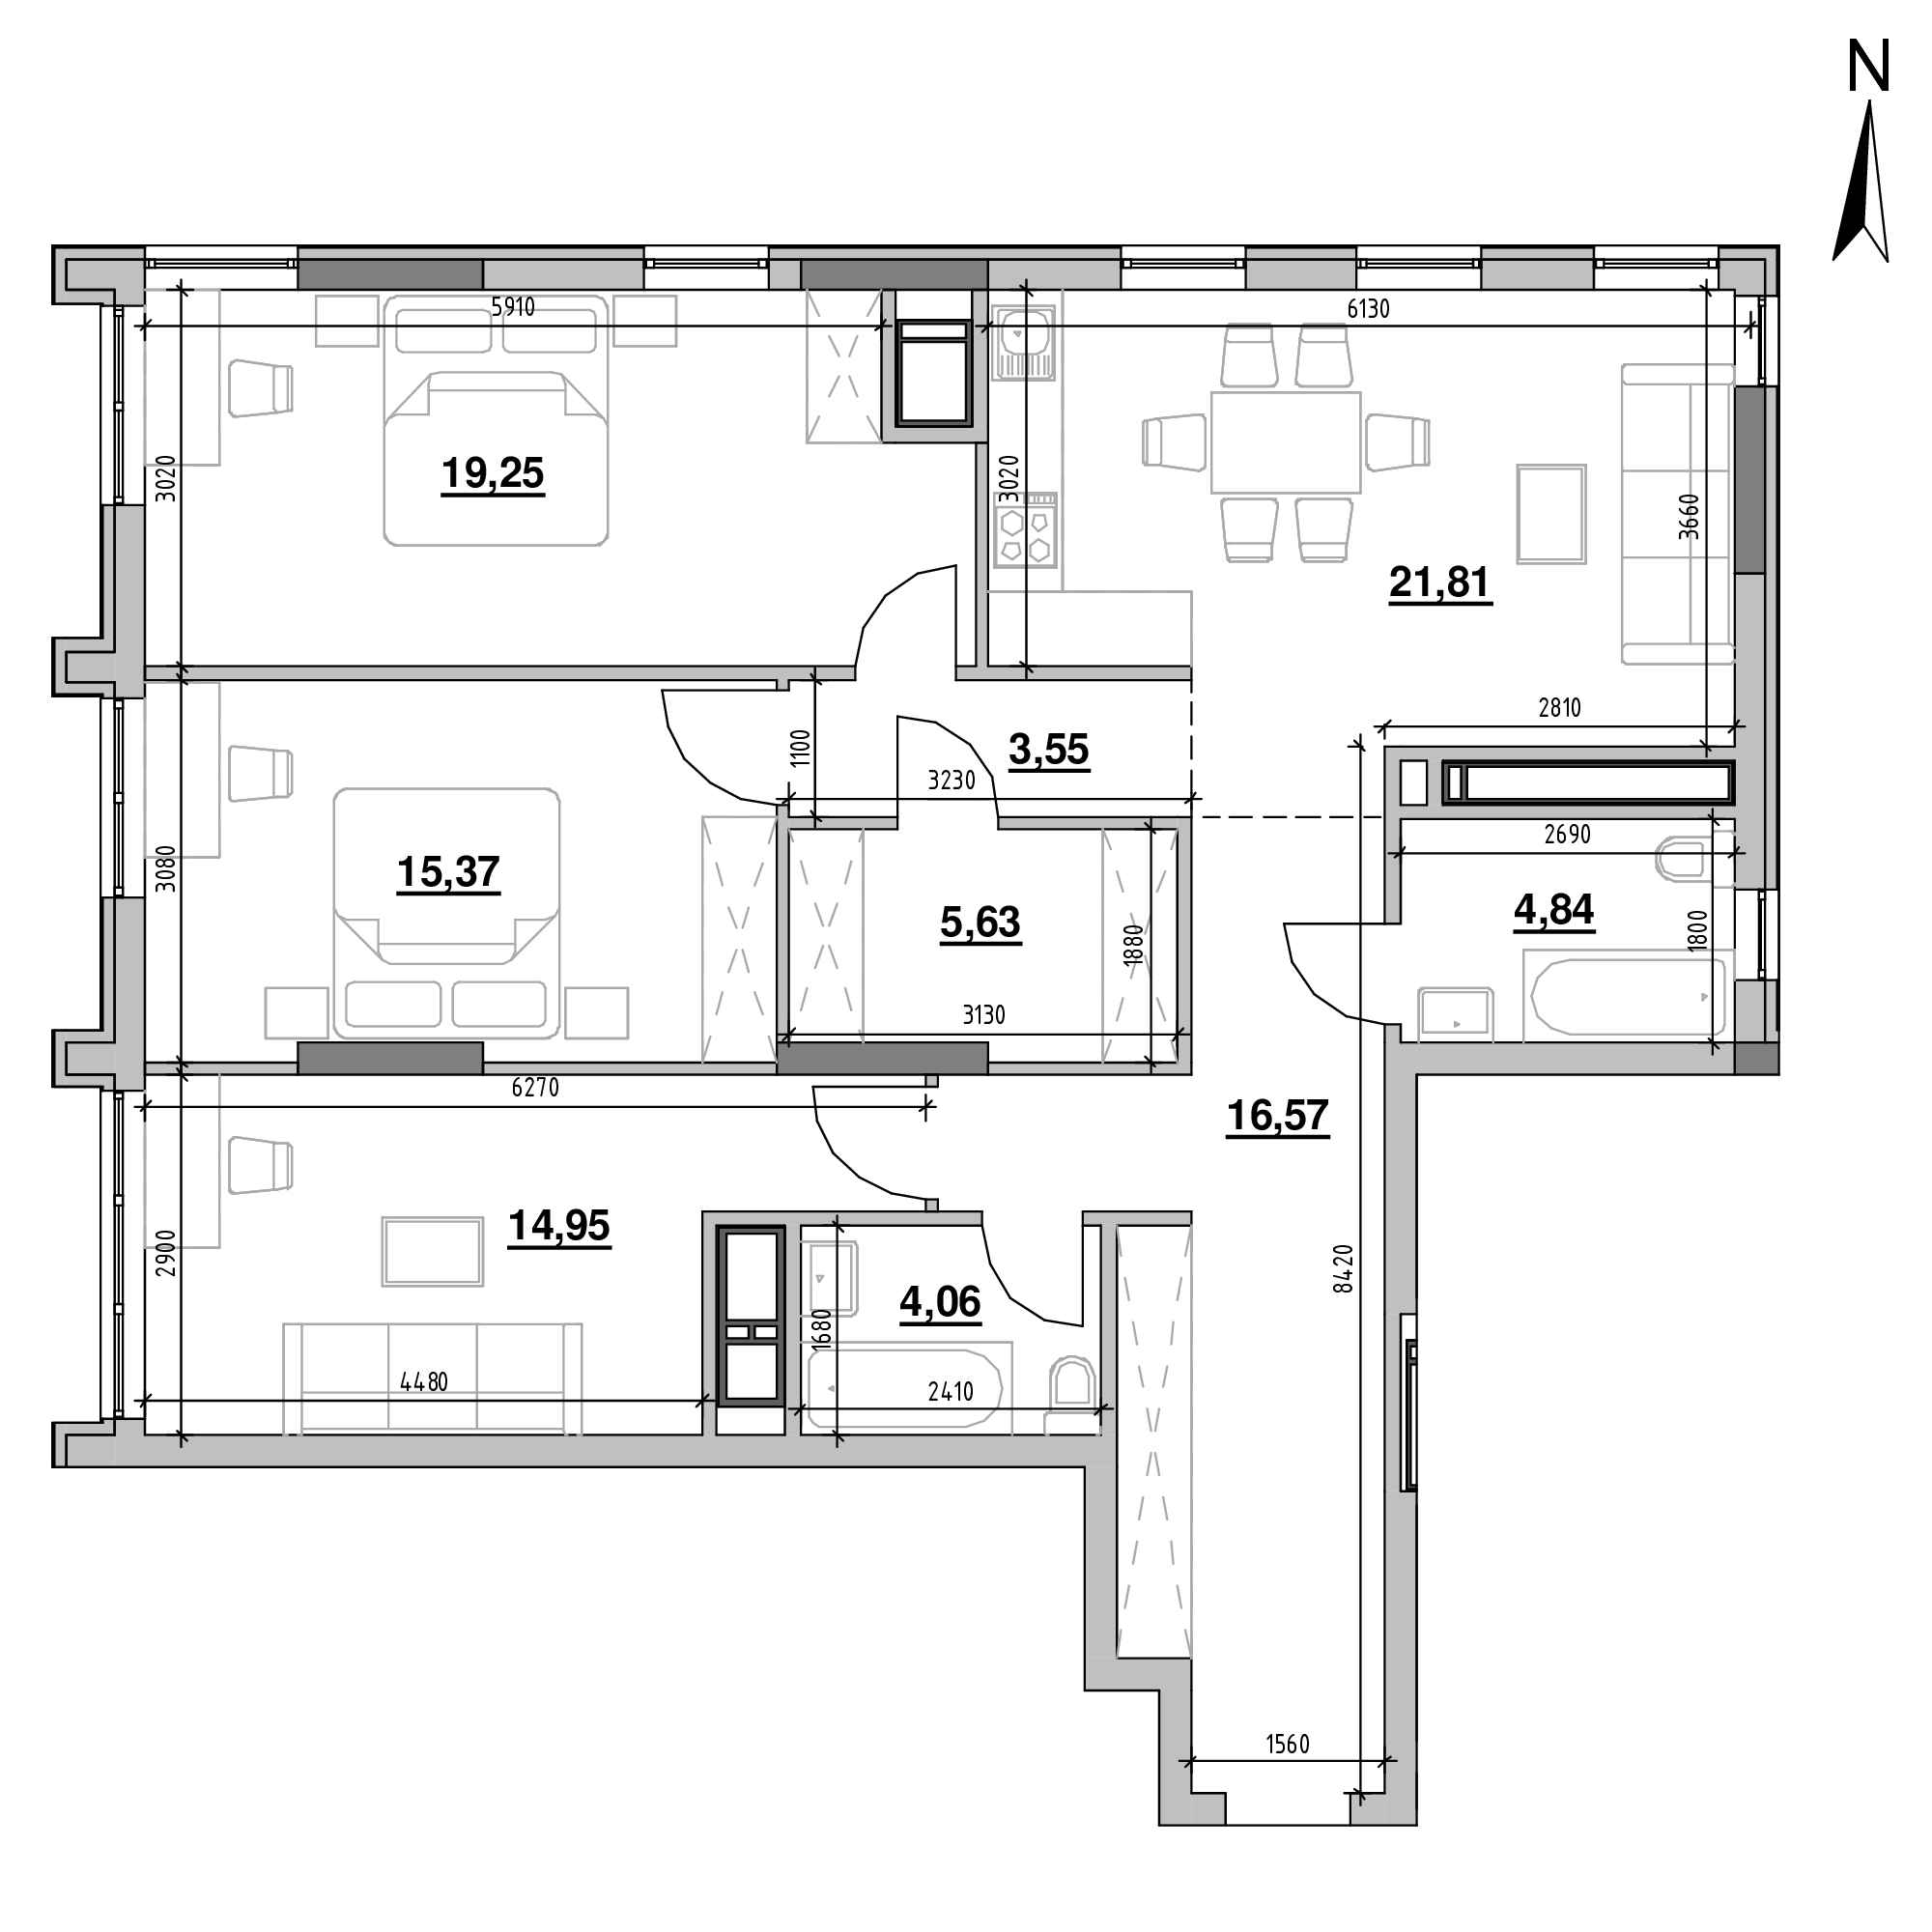 ЖК Nordica Residence: планування 1-кімнатної квартири, №178, 40.97 м<sup>2</sup>